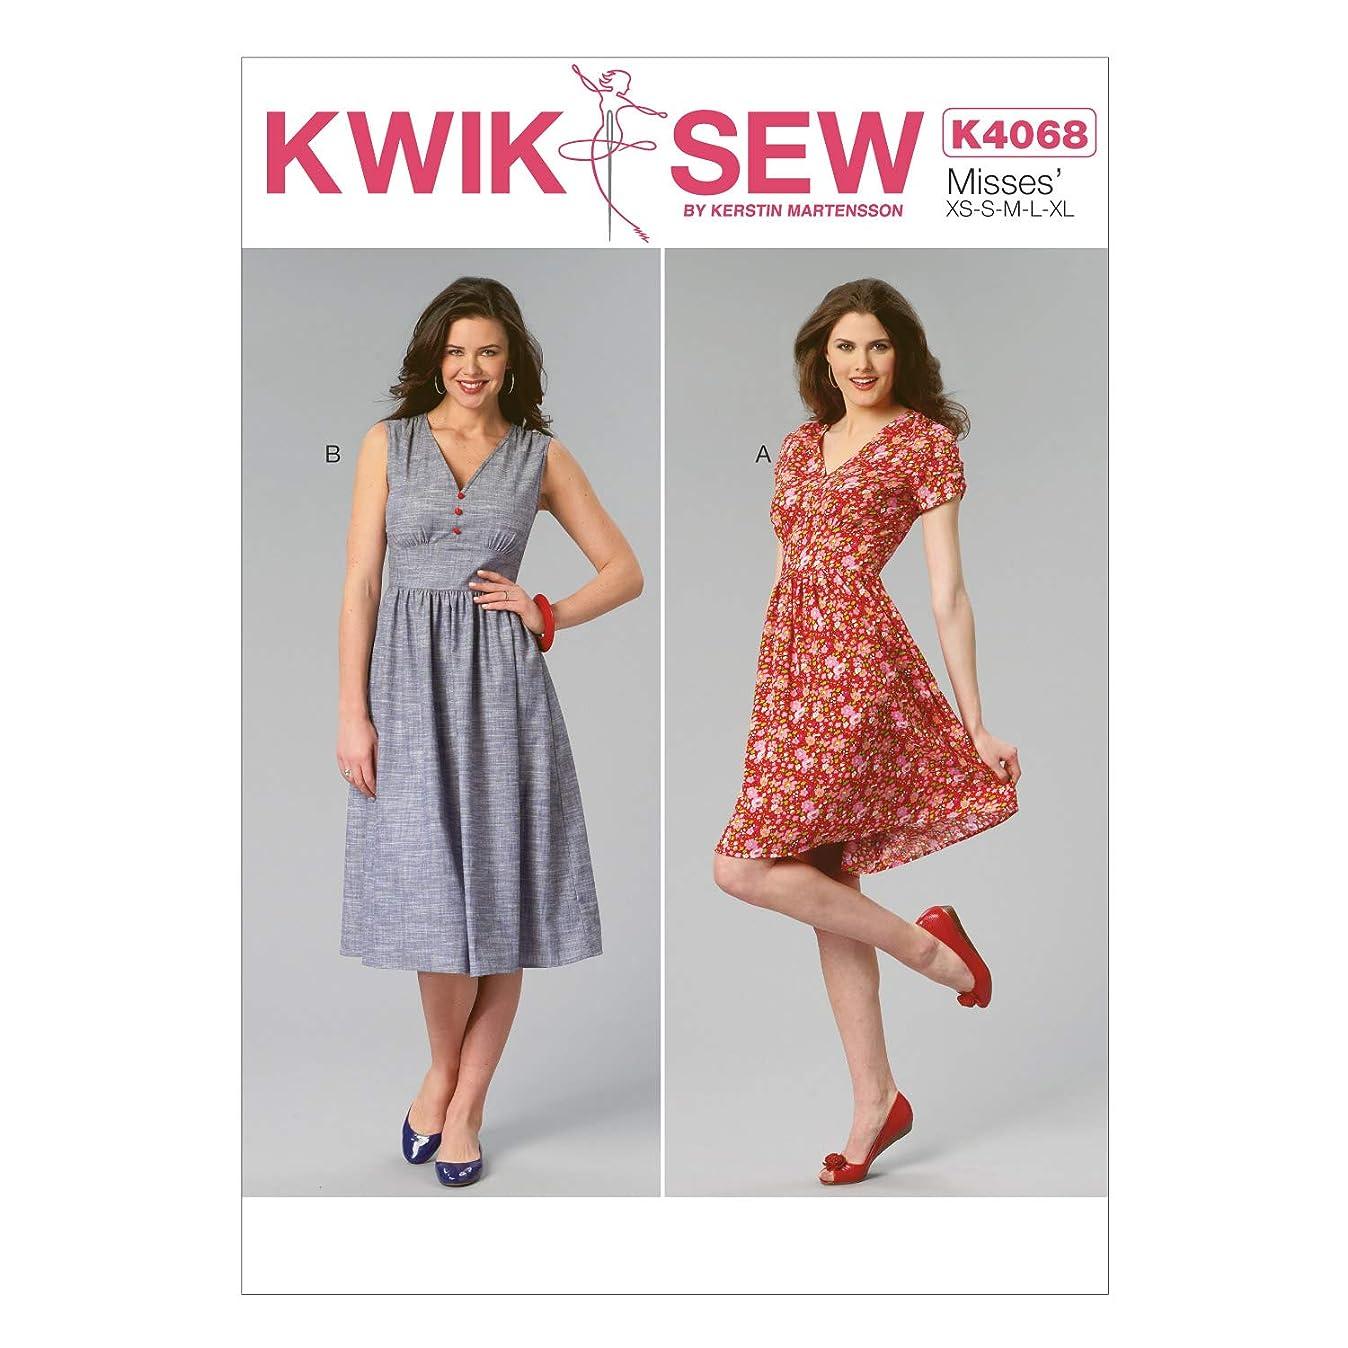 KWIK-SEW PATTERNS K4068 Misses' Dresses n6546677654